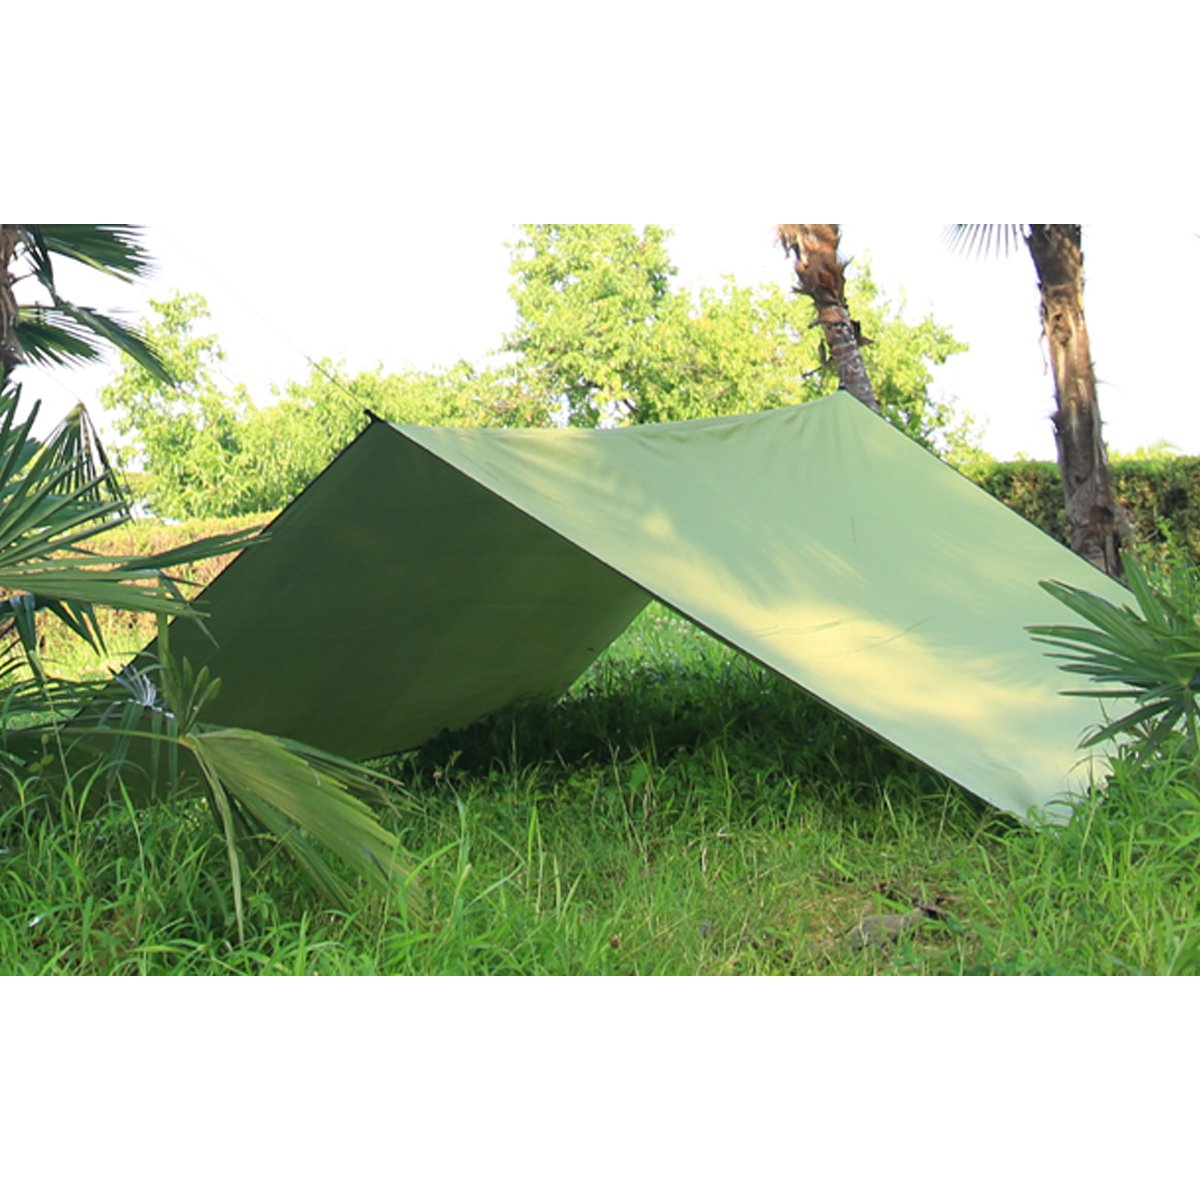 Camping Tent Tarps Waterproof Windproof Snowproof Hammock Rain Fly Shelter Ripst